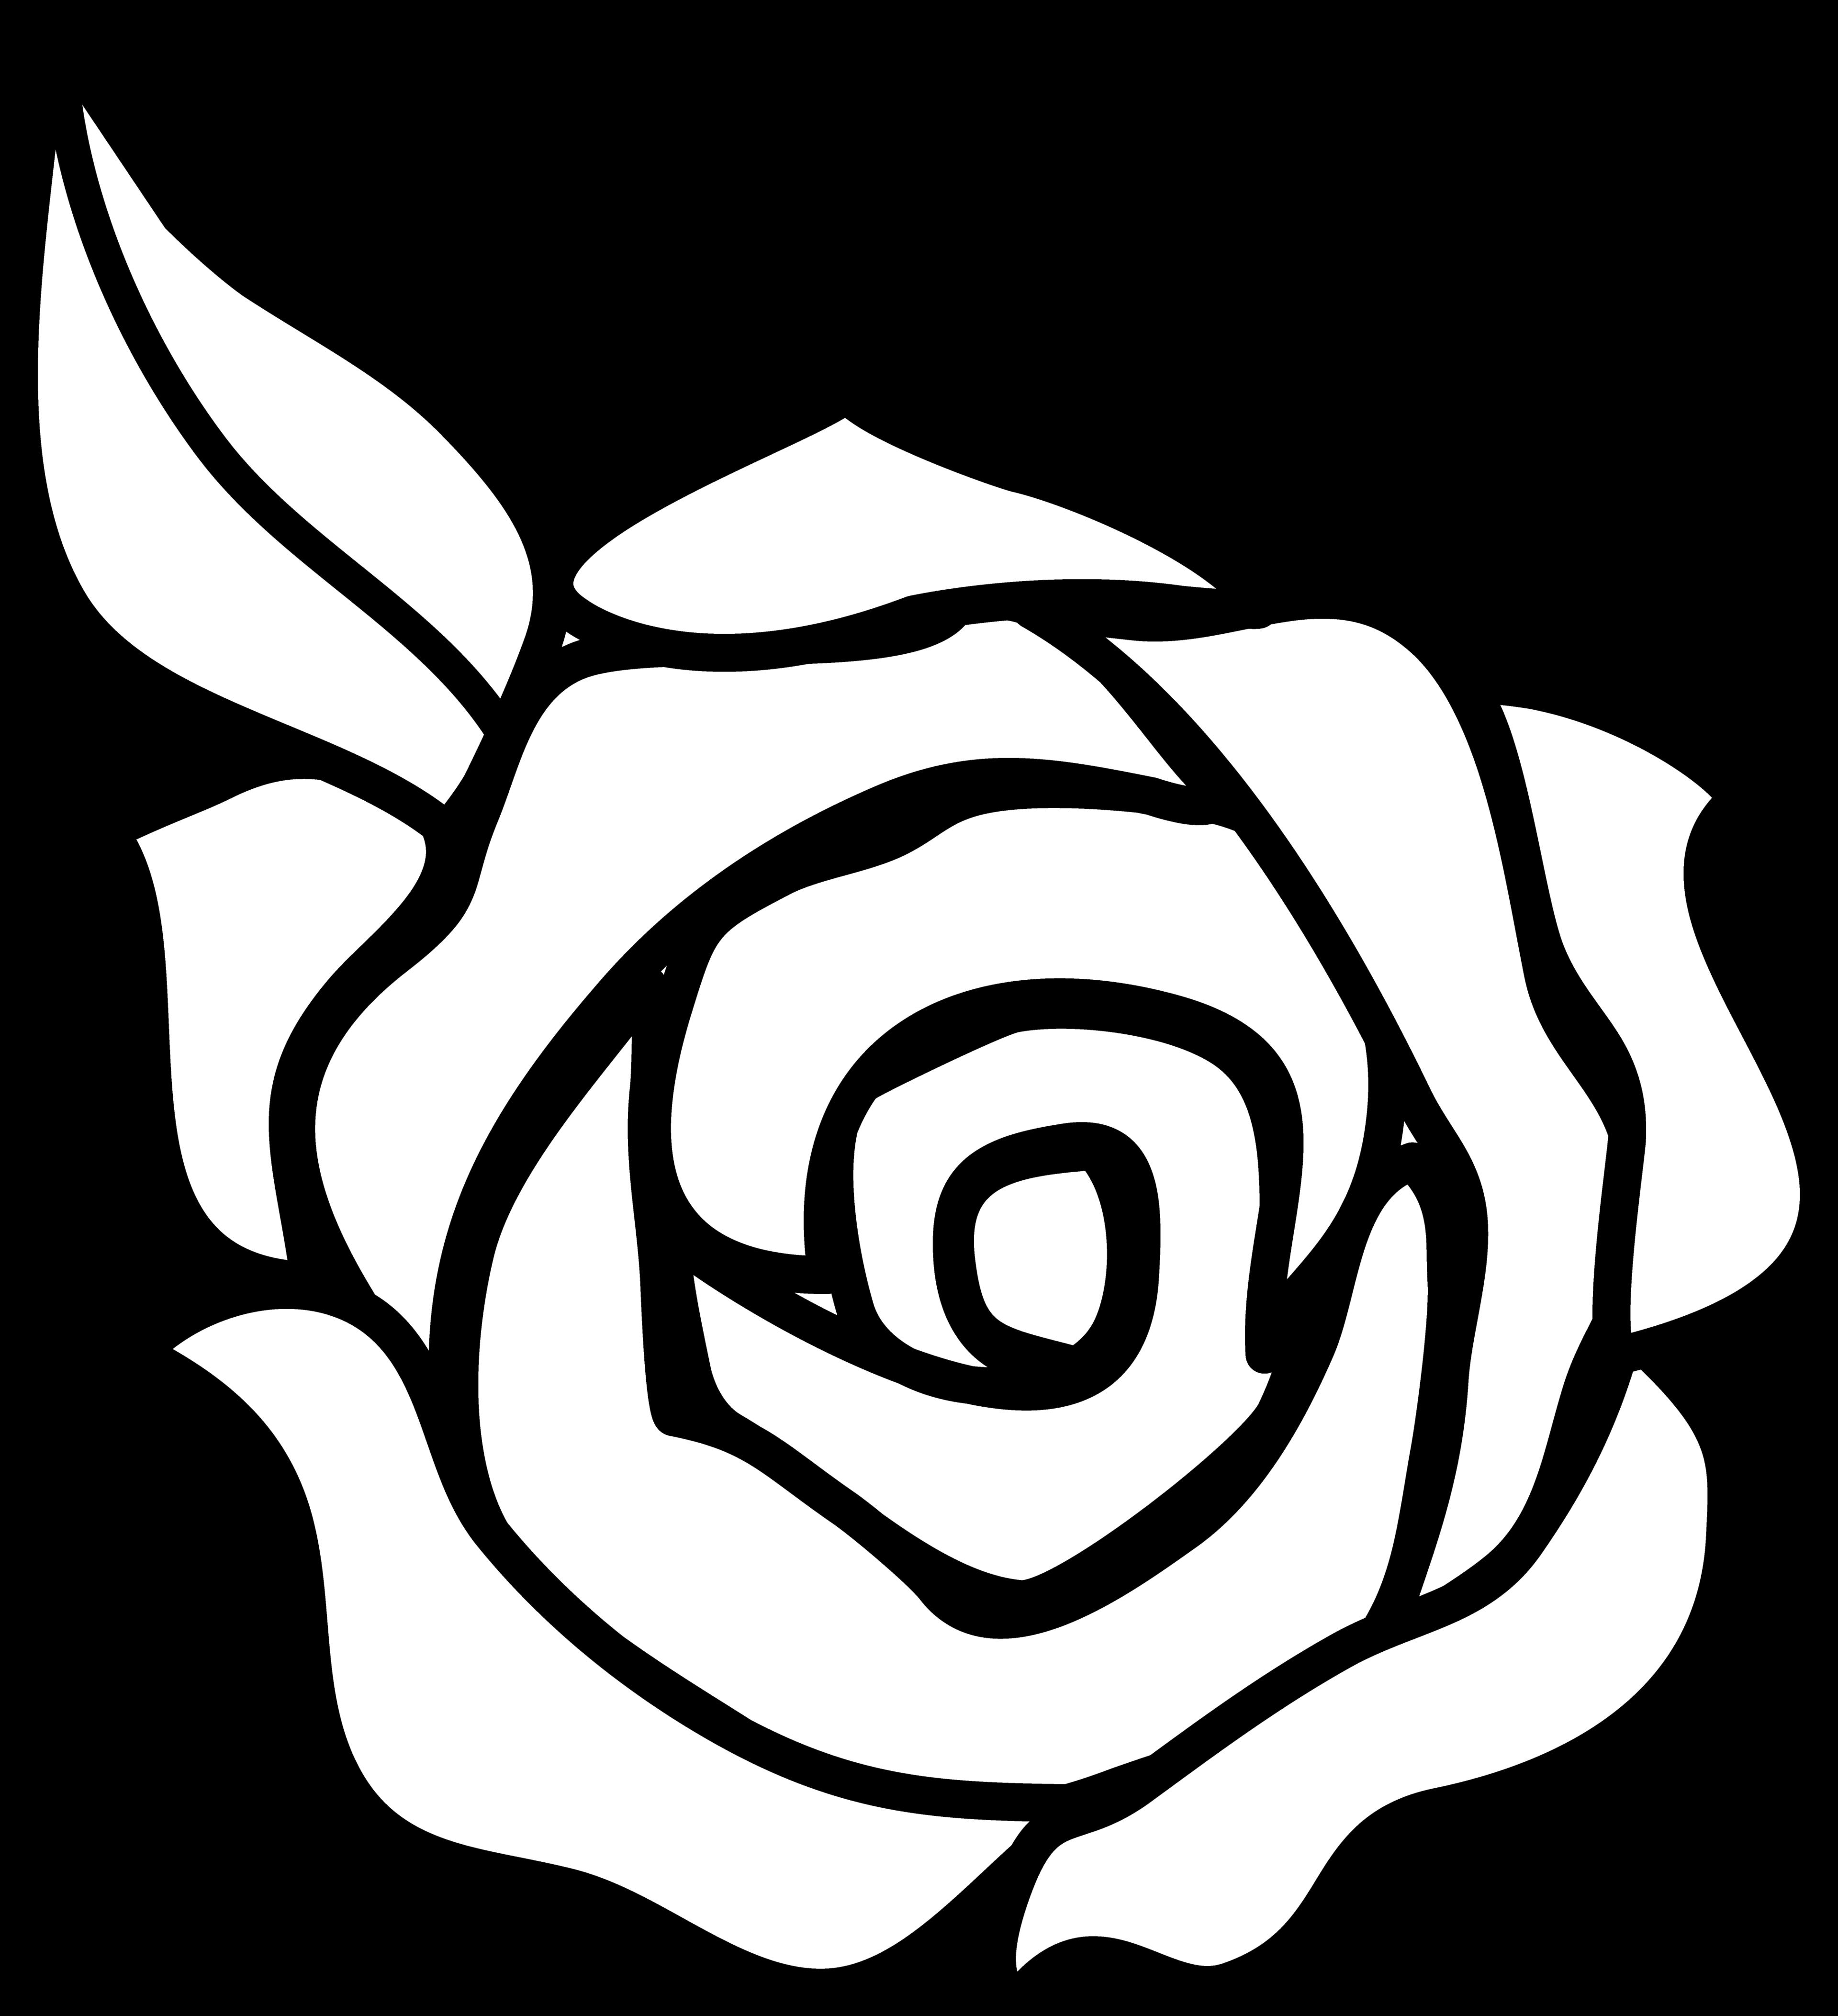 Rose Outline Clipart Panda .